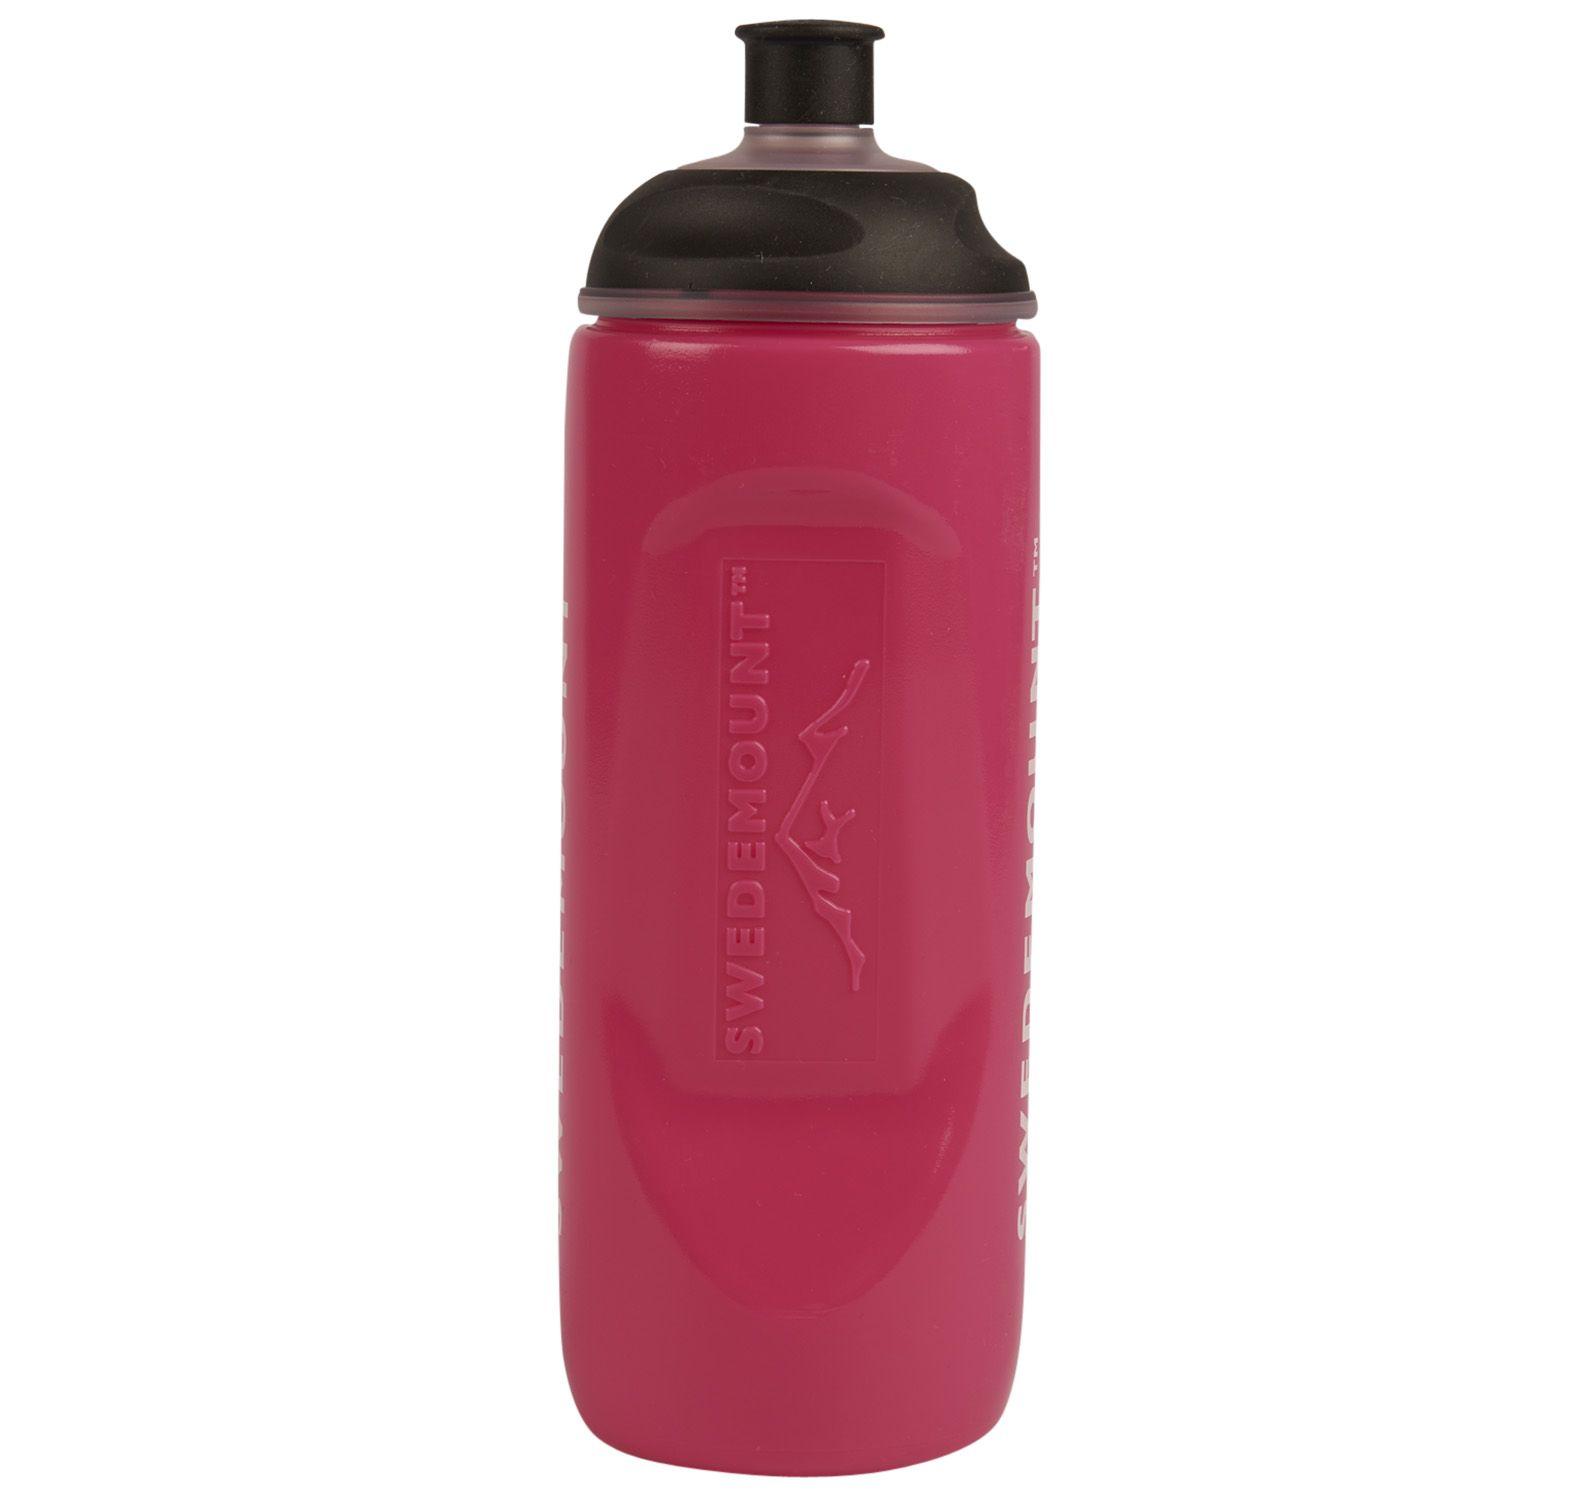 Swedemount Plastic Bottle, Fresh Pink, Onesize, Swedemount